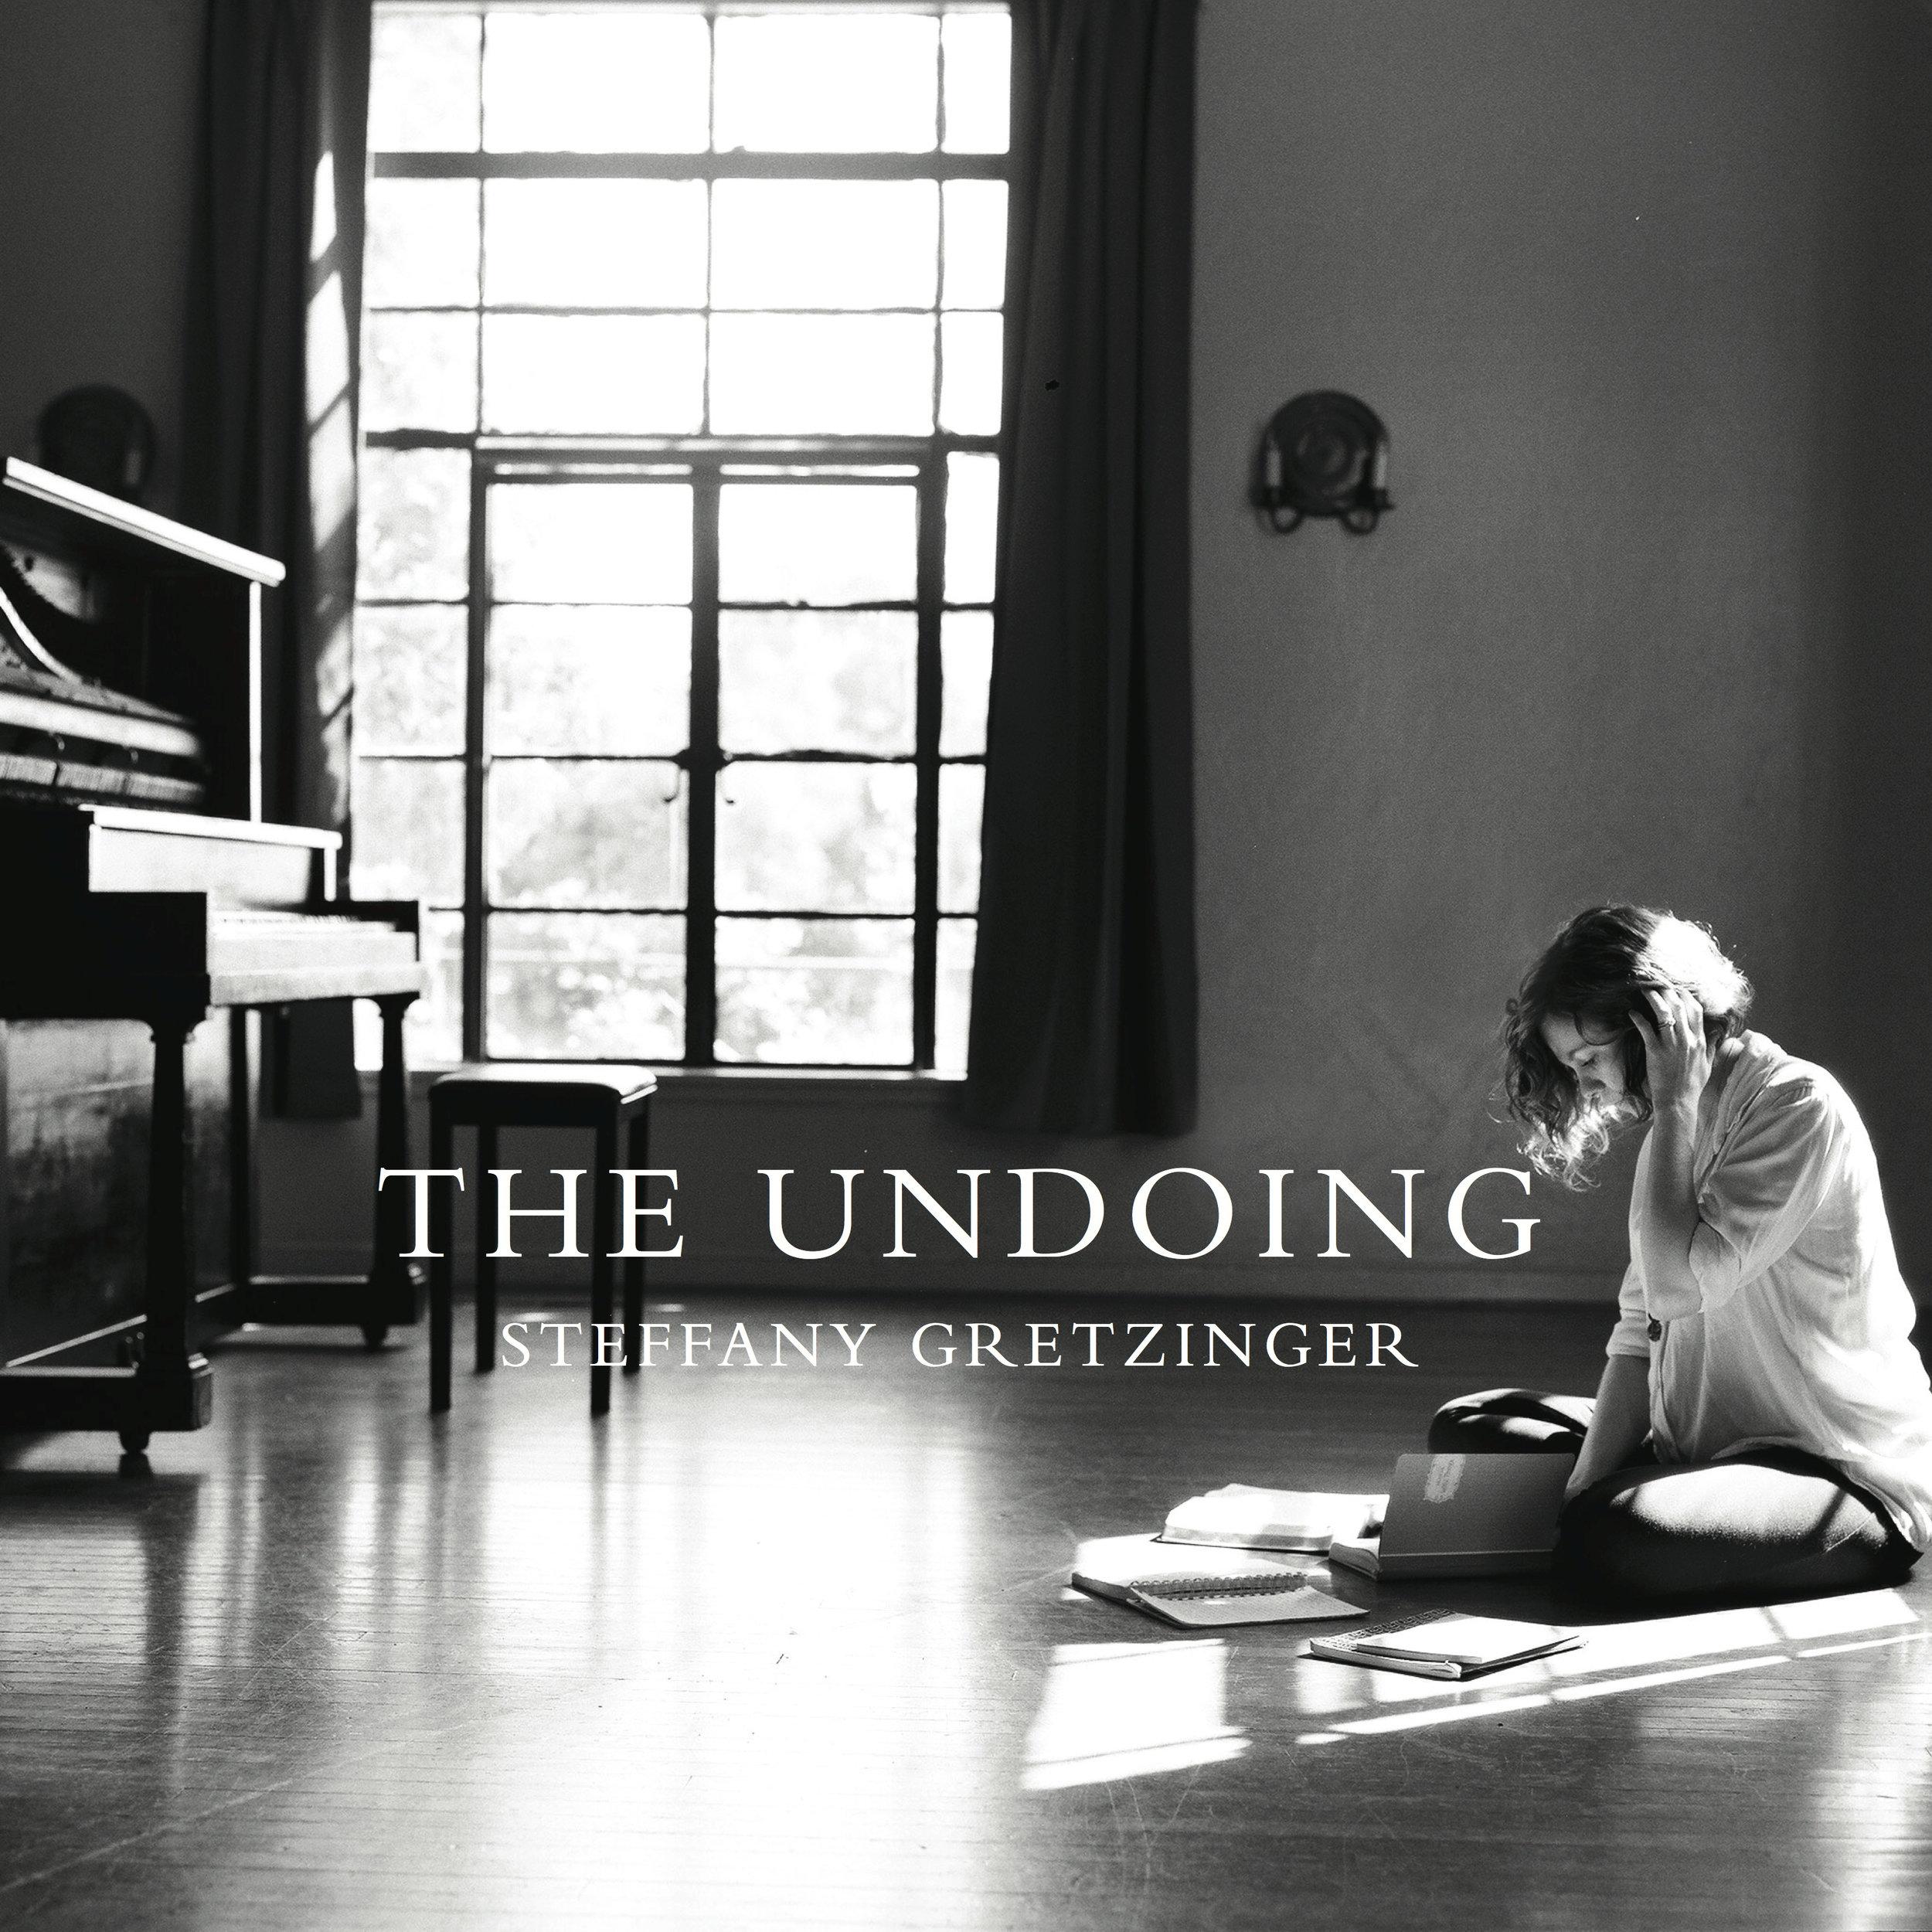 The Undoing - Steffany GretzingerRelease Date: 8/26/2014Rating: 9.5 / 10